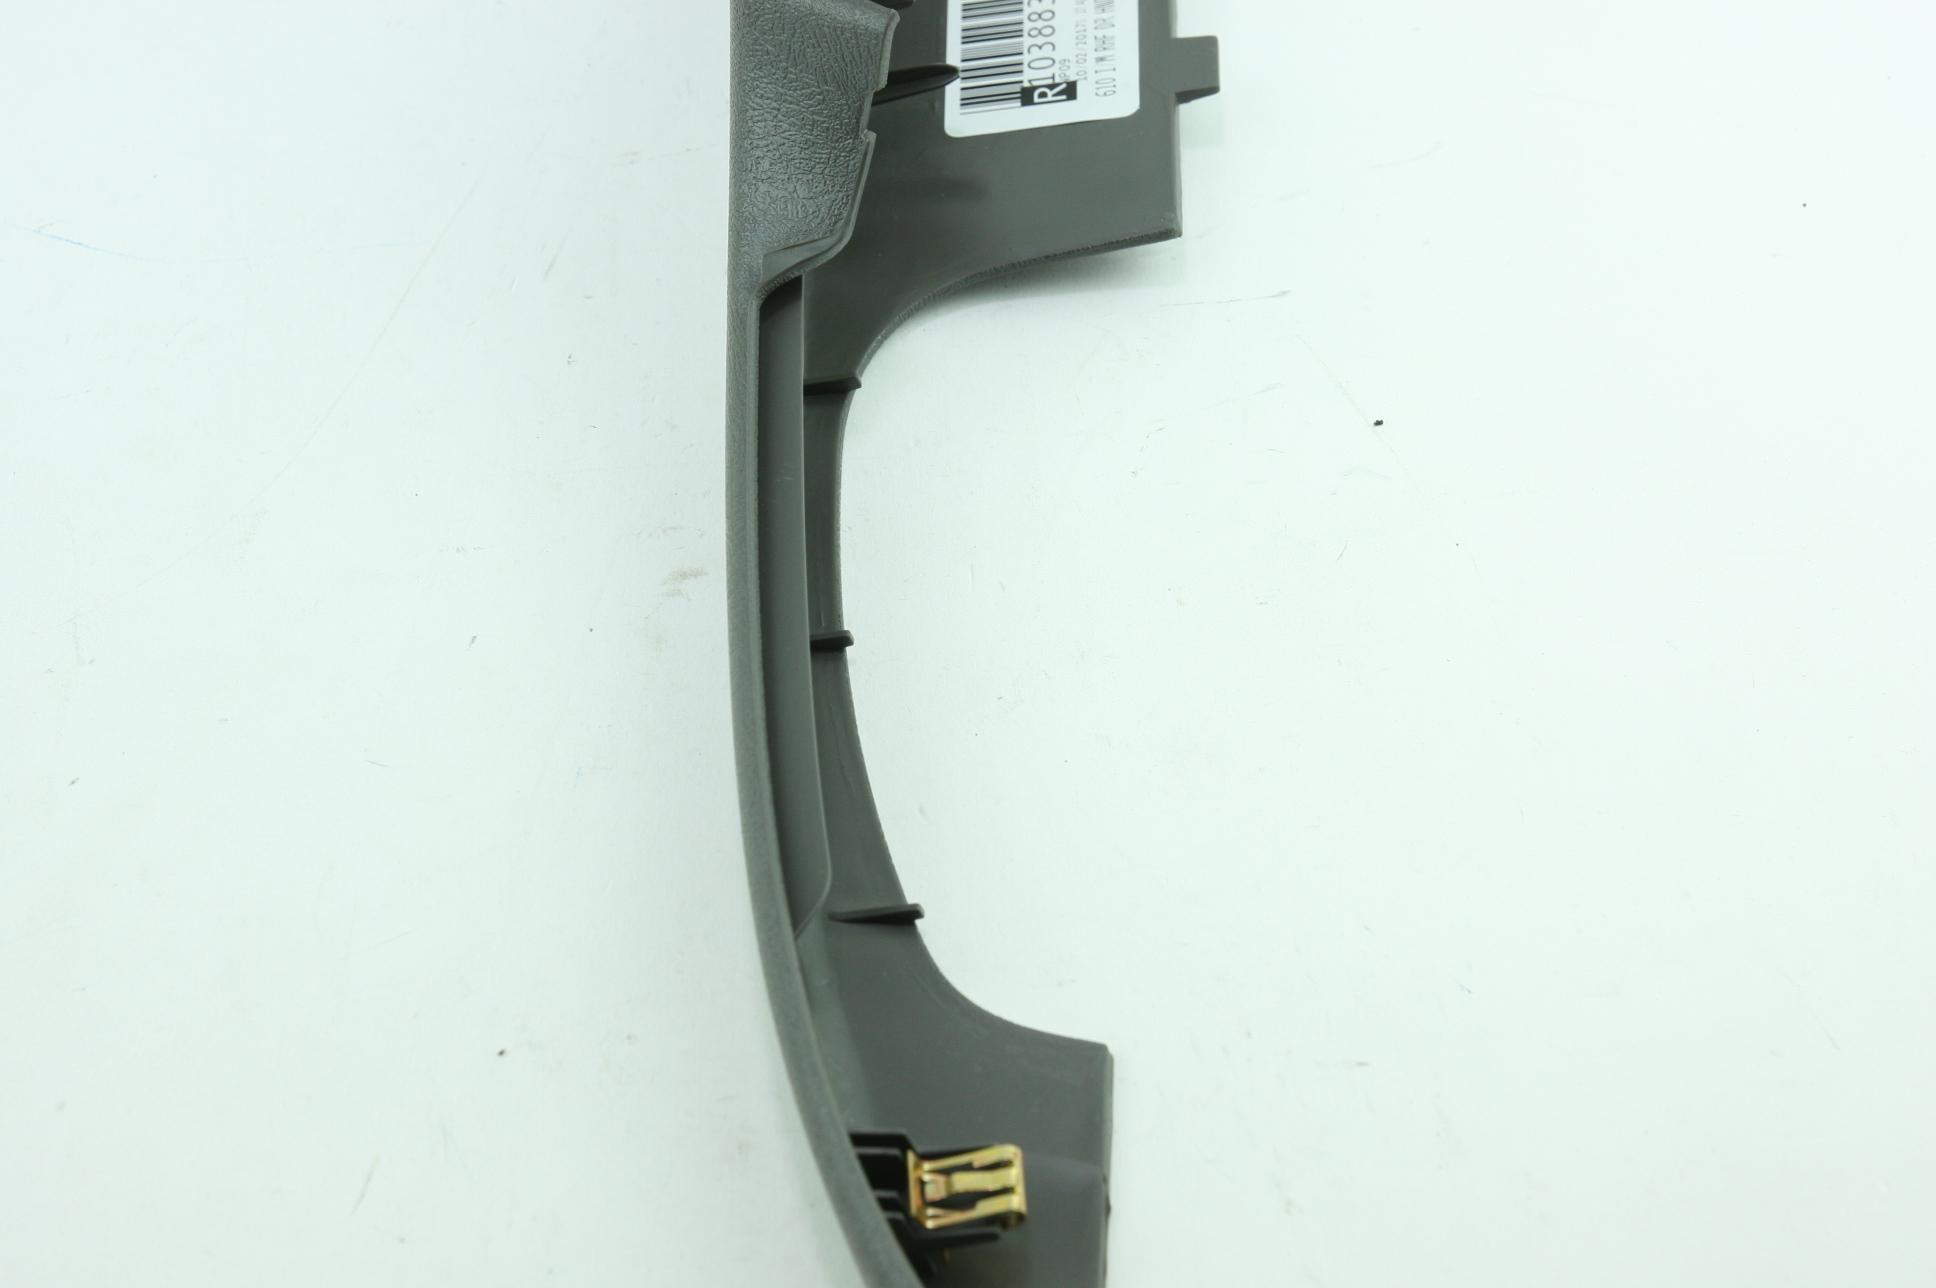 * New OEM 10388387 GM Express Savana Passenger Door Armrest Handle Pewter Gray - image 7